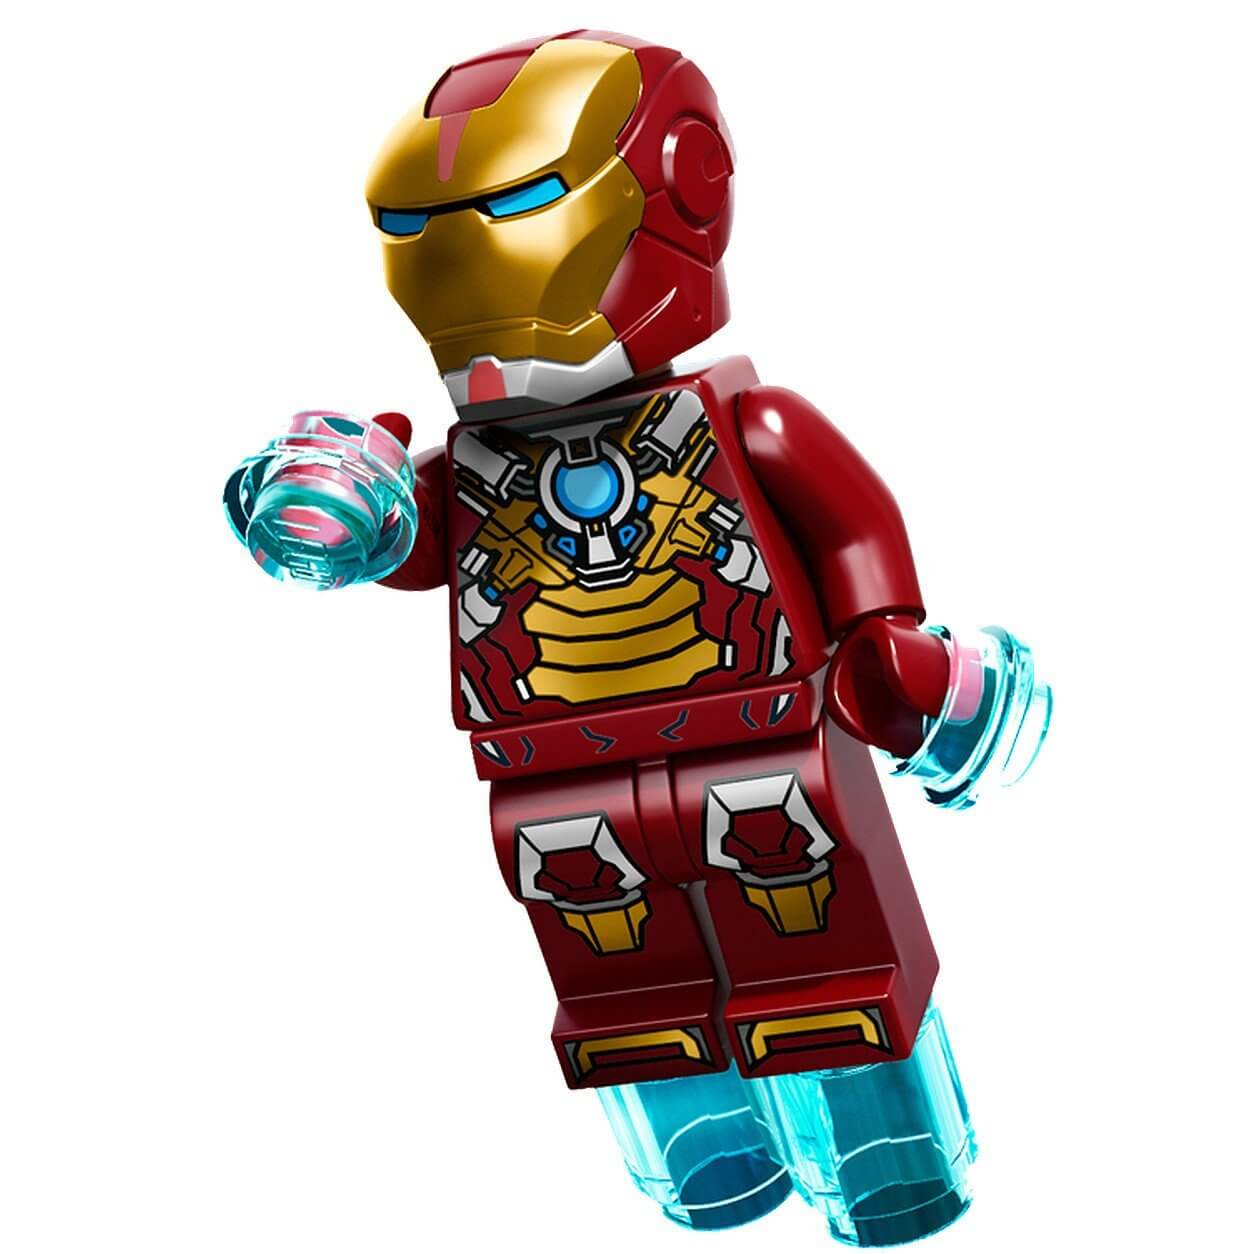 LEGO Superheroes Iron Man Heart Breaker Armor Minifigure ...